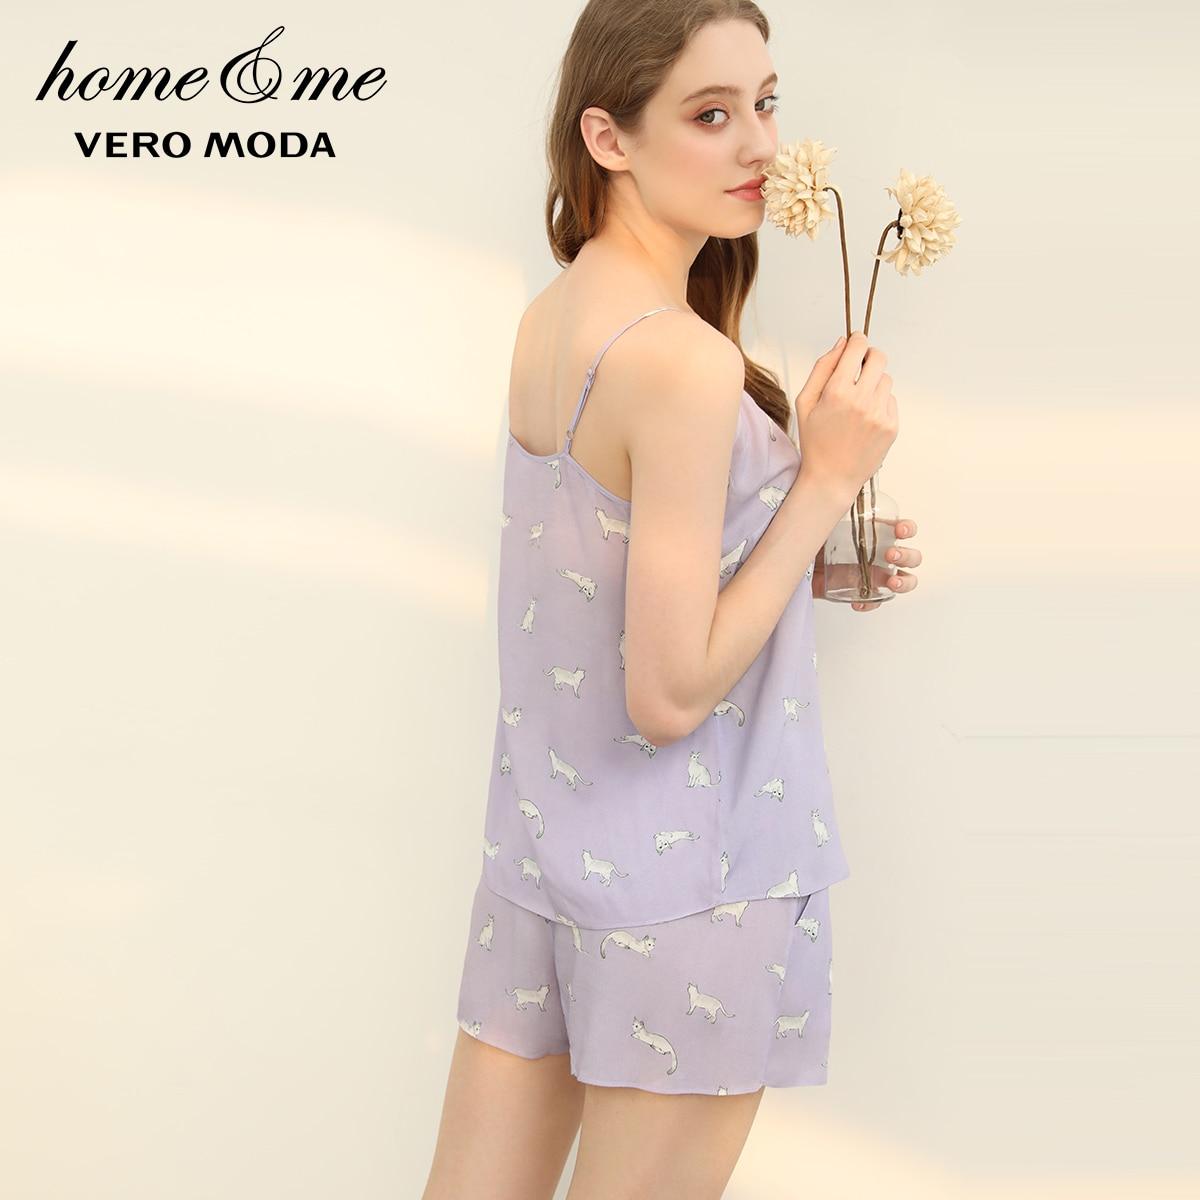 Image 3 - Vero Moda 2019 New Arrivals Cat Print Sun top Leisure Homewear Pajamas Set   3192TC505-in Pajama Sets from Underwear & Sleepwears